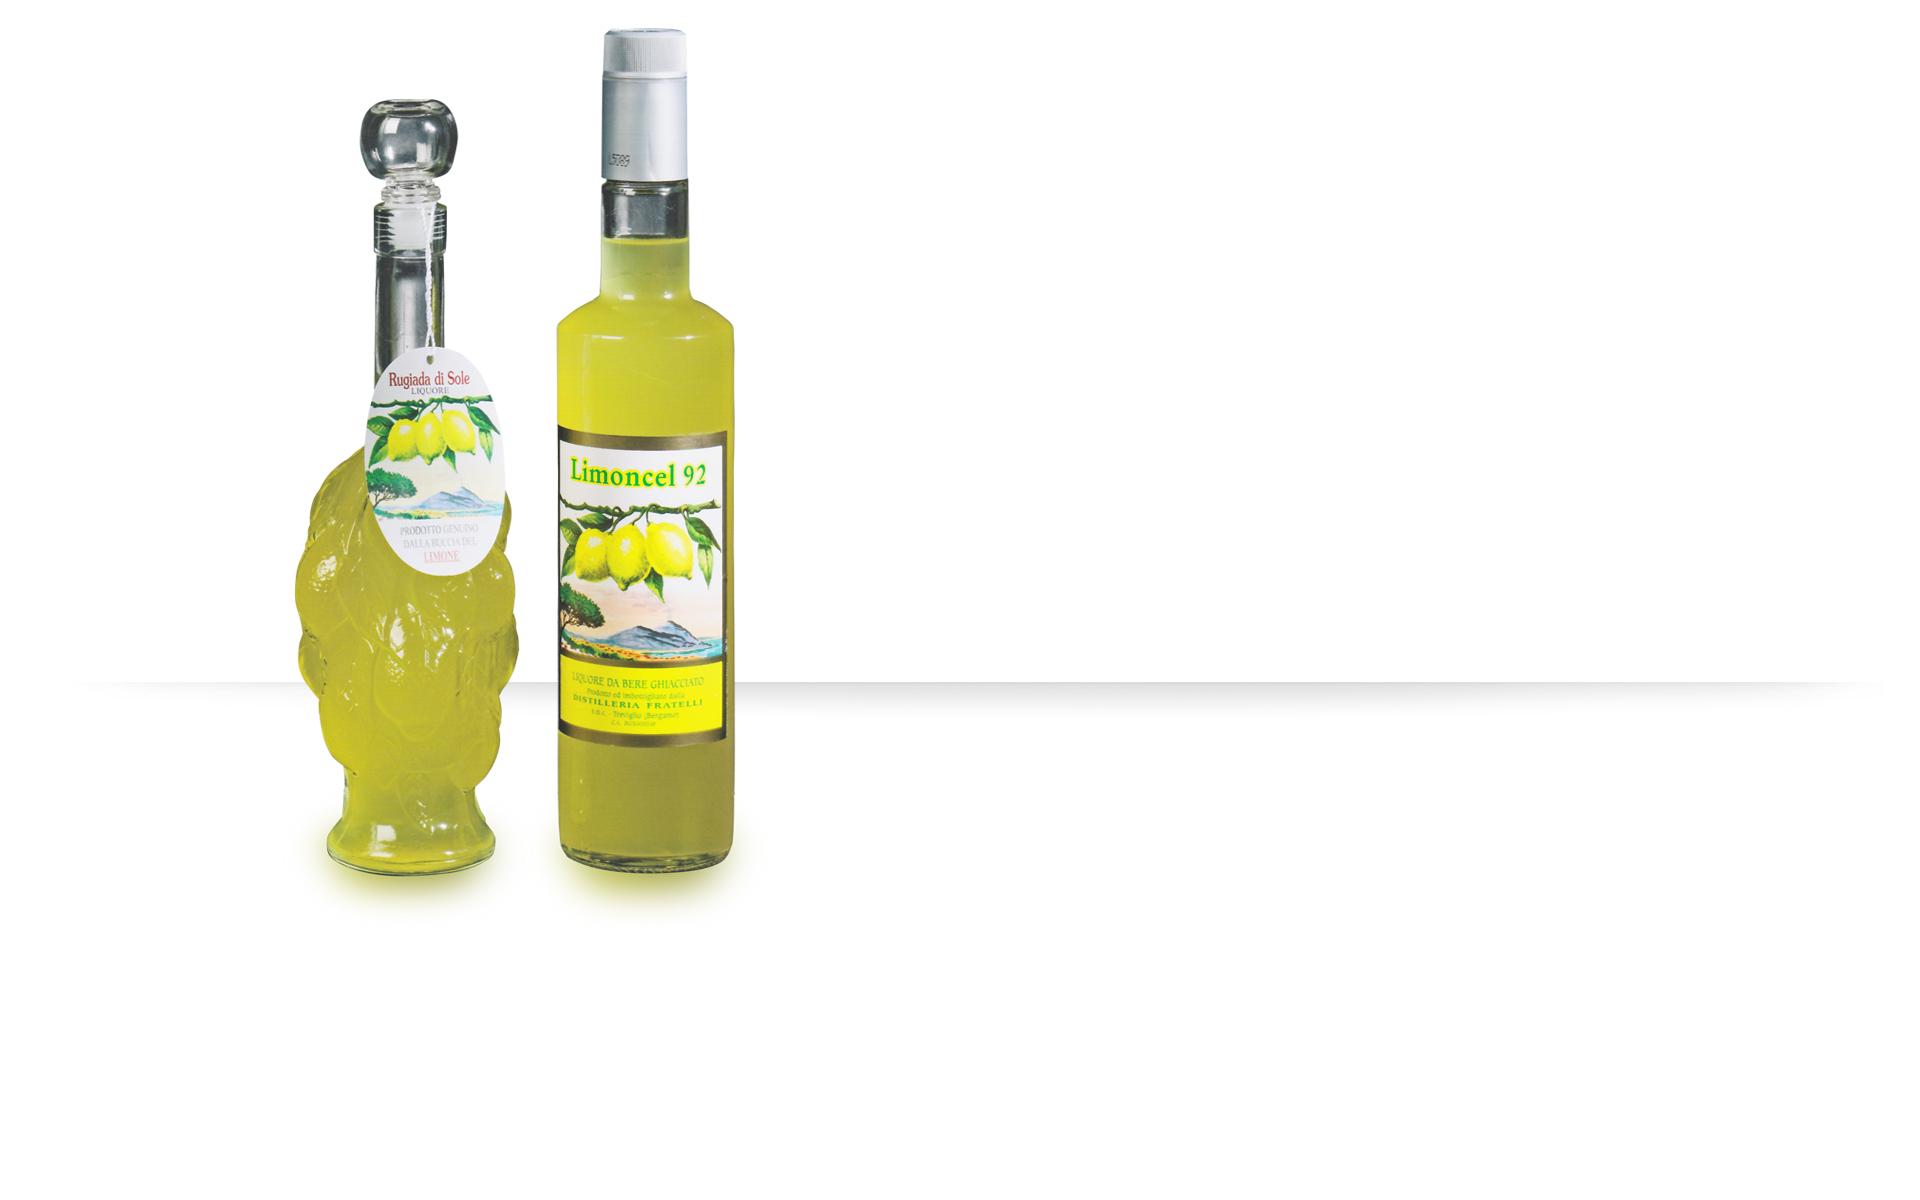 Limoncello, Limoncello Distilleria Fratelli